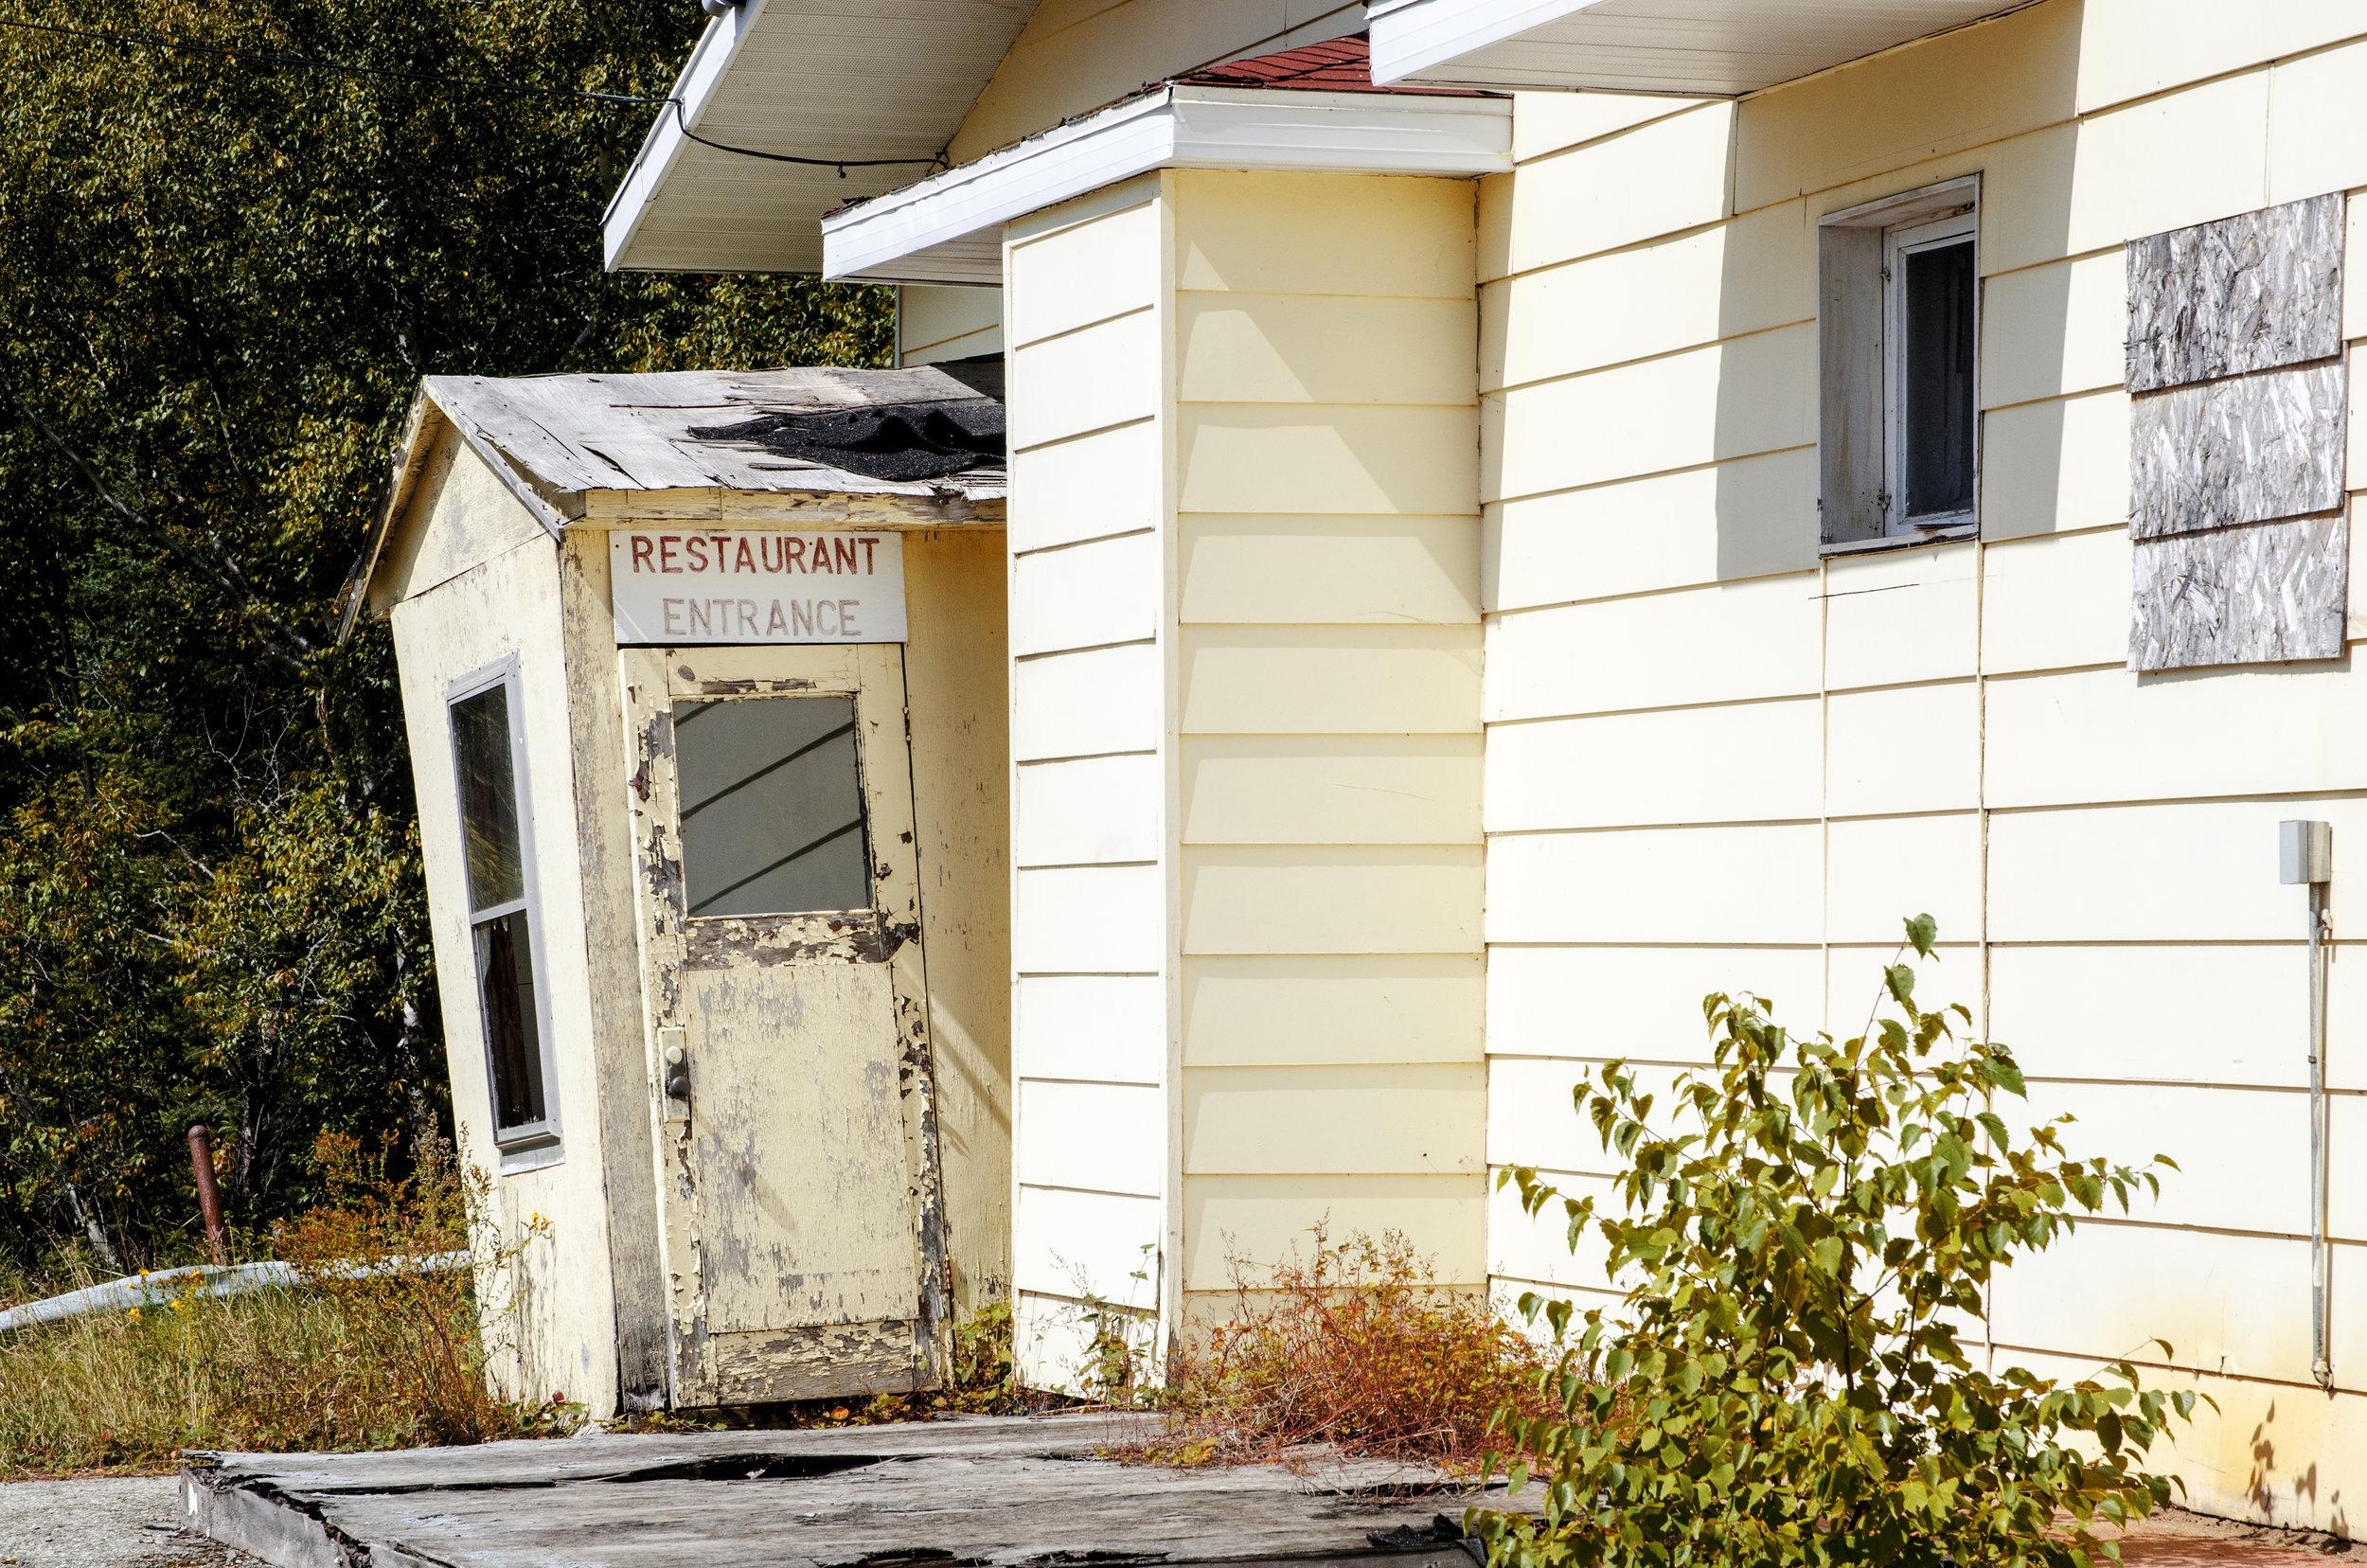 Jenkins, Cheyenne. Restaurant Entrance. 2017. Digital Photography. Wawa, Ontario